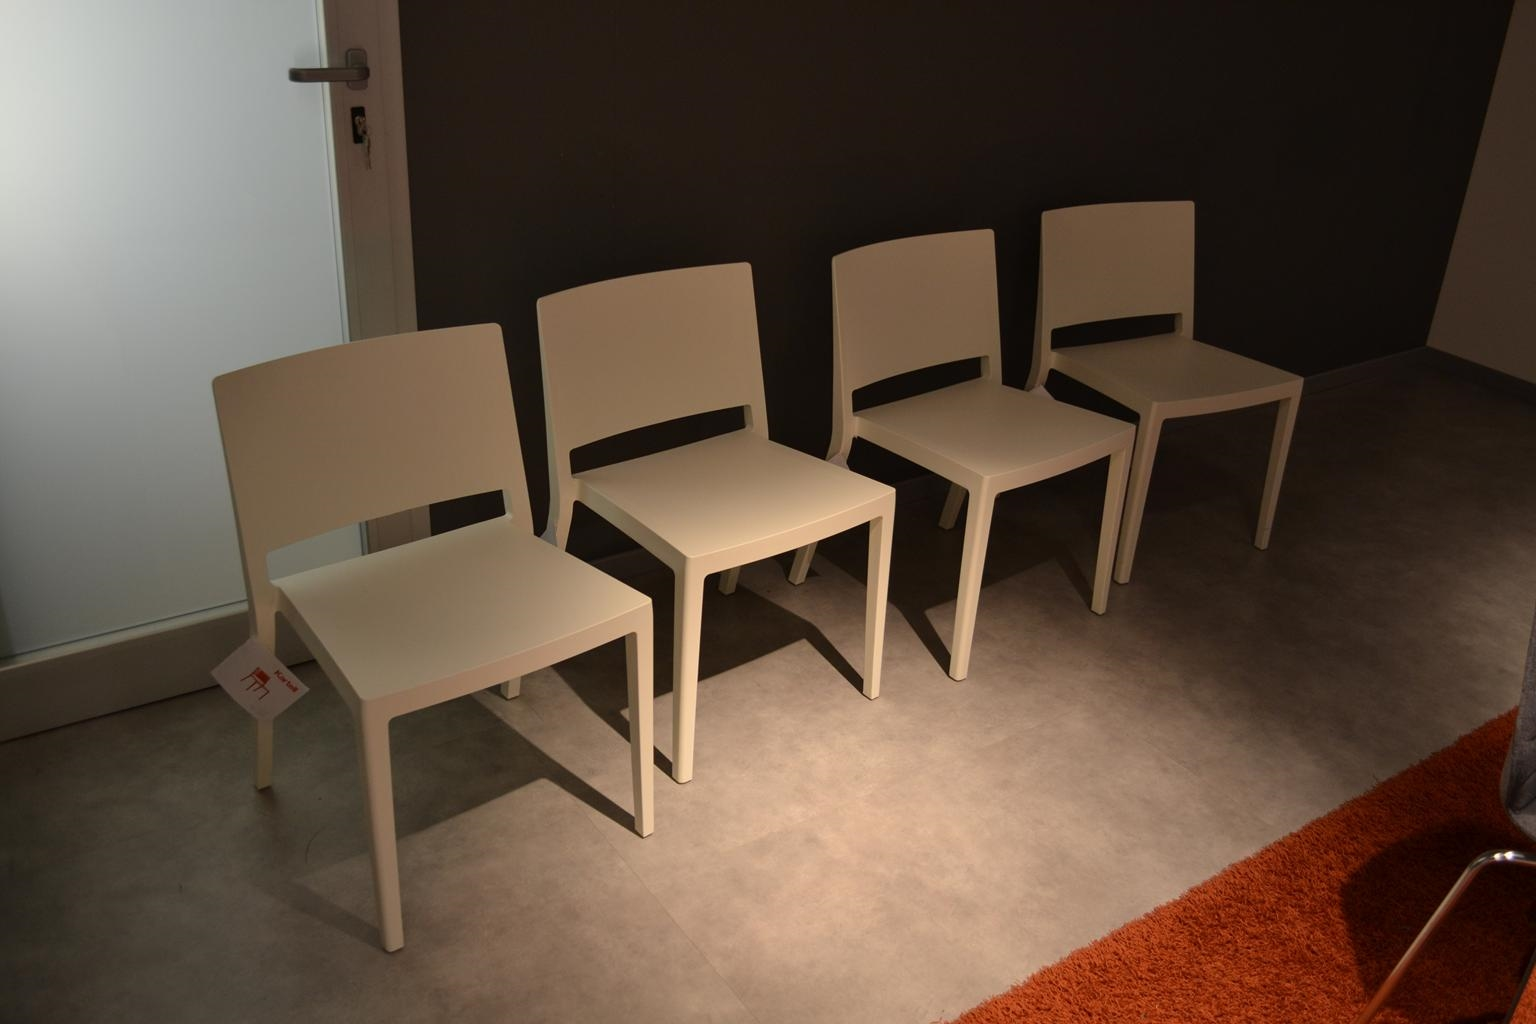 kartell 4 sedie lizz bianche sedie a prezzi scontati On sedie della kartell